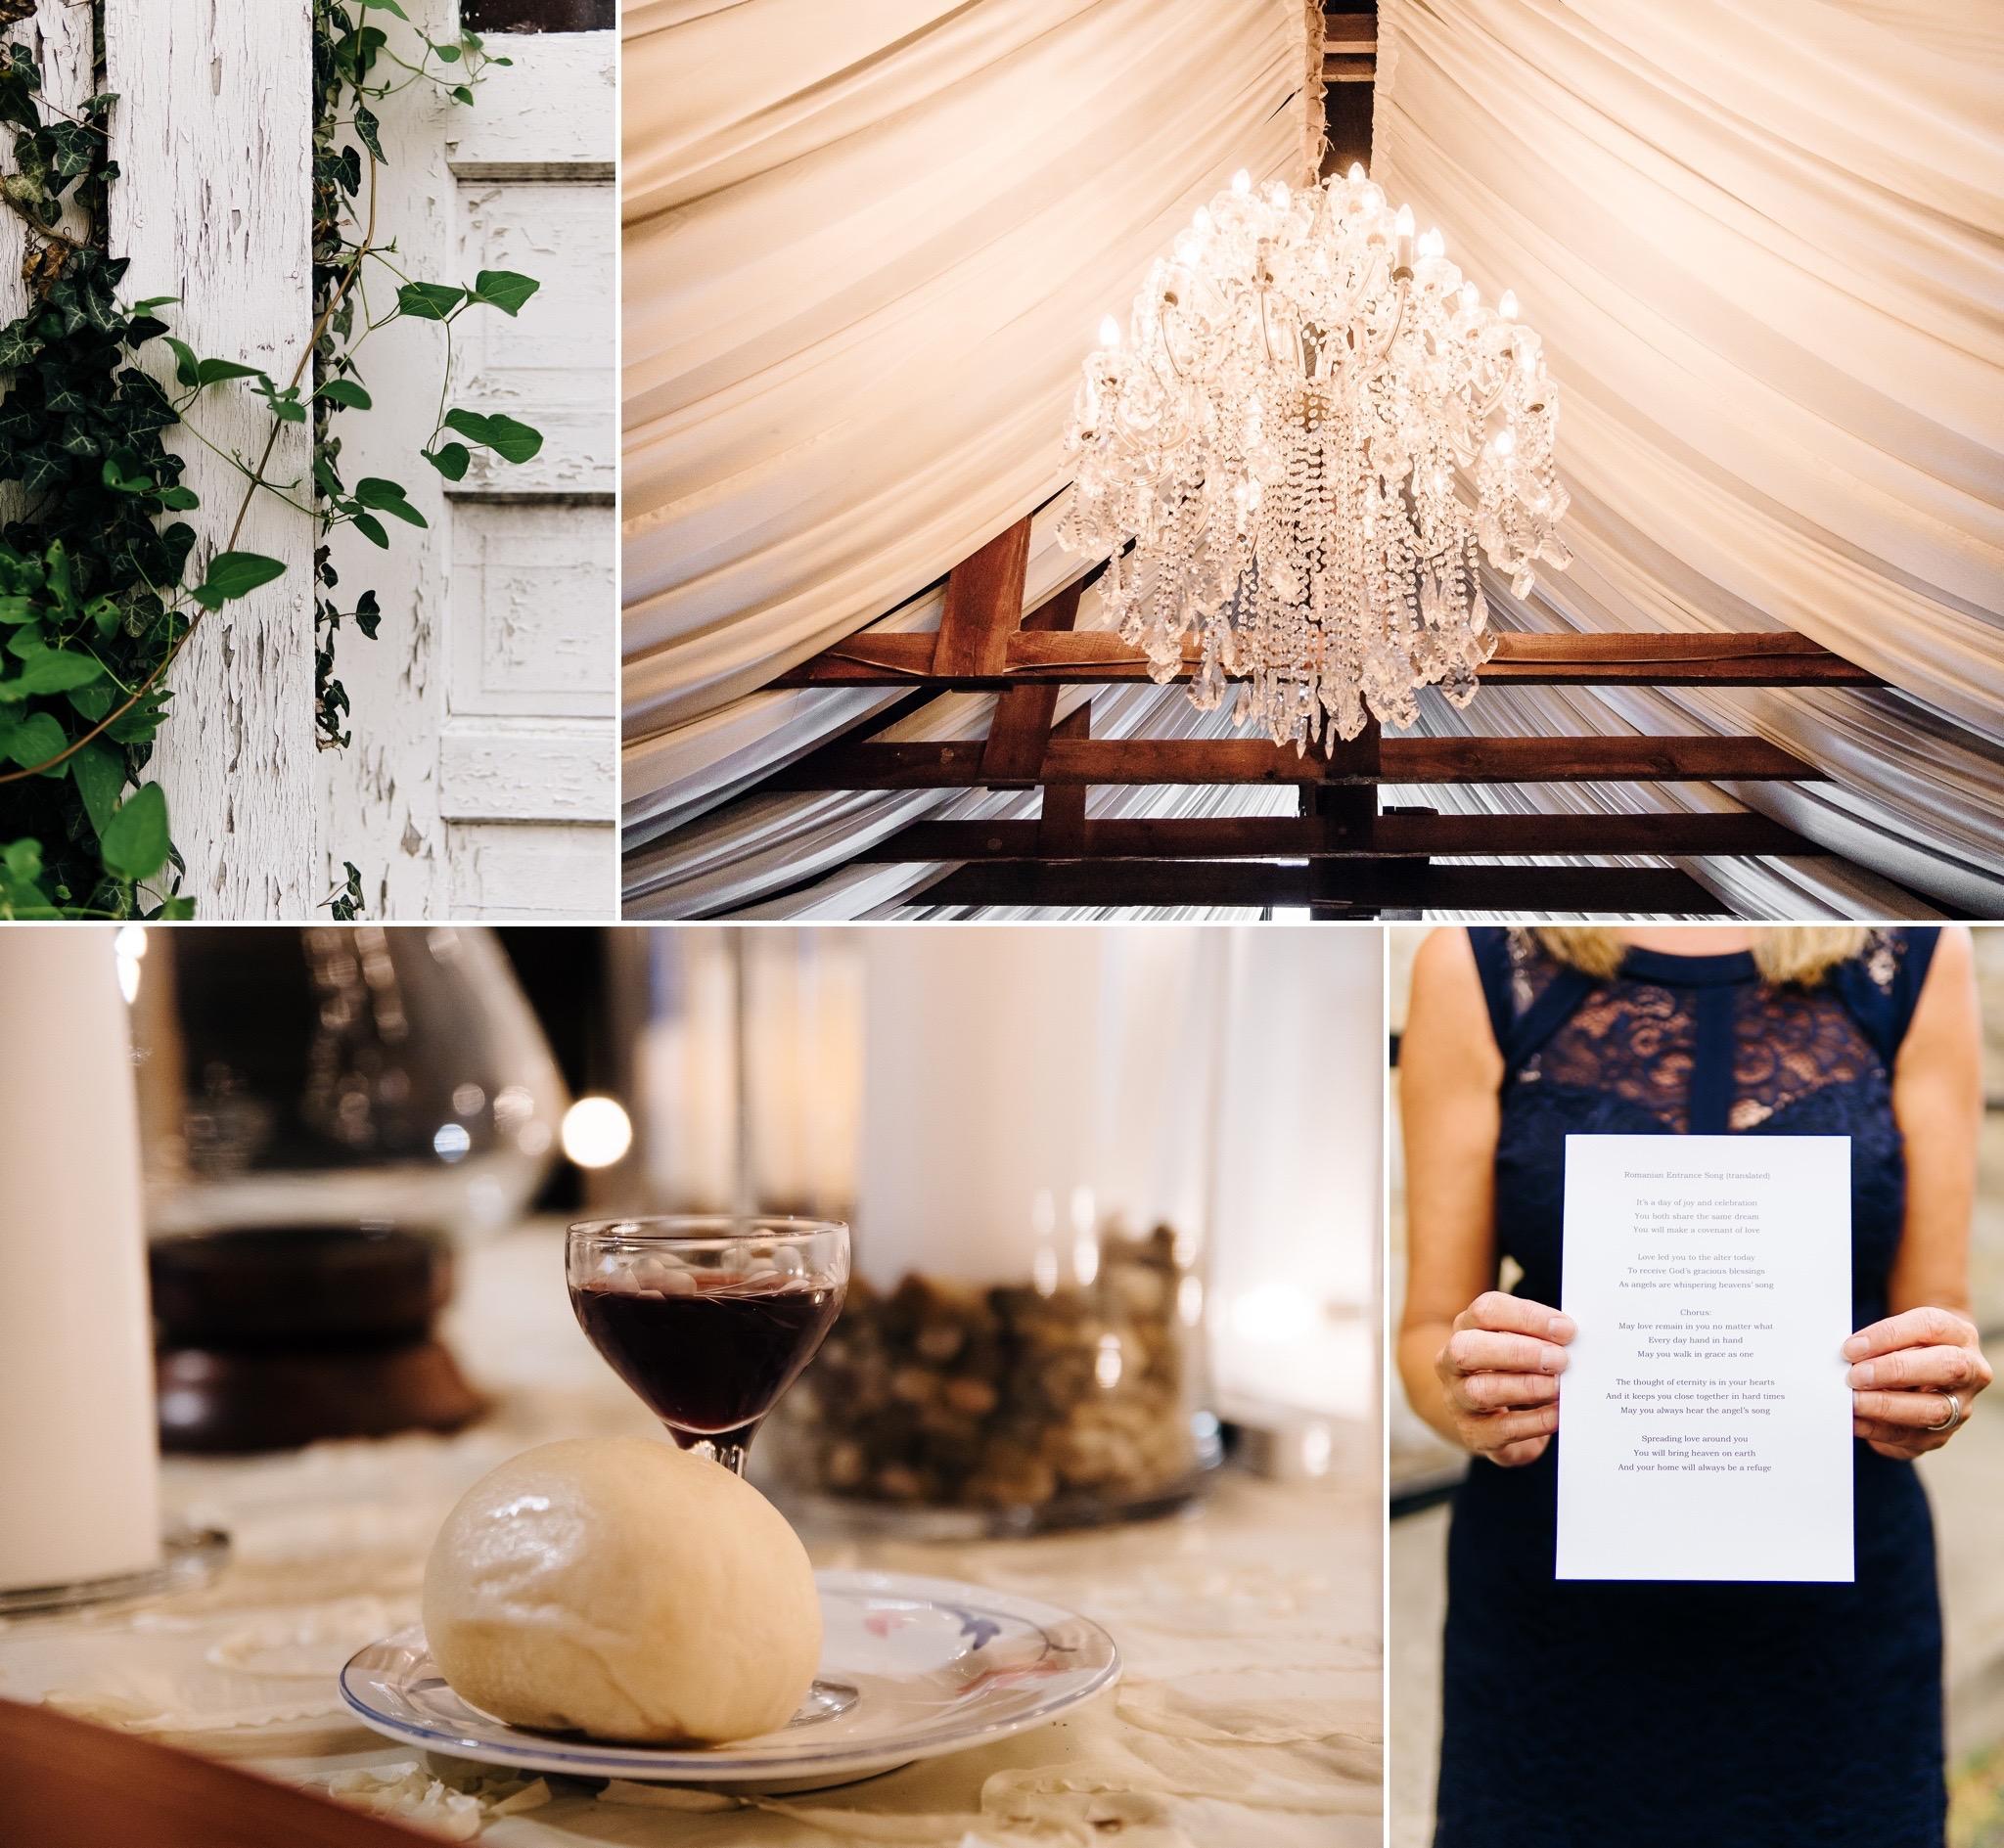 intimate_kyle_house_wedding_virginia_jonathan_hannah_photography-9.jpg